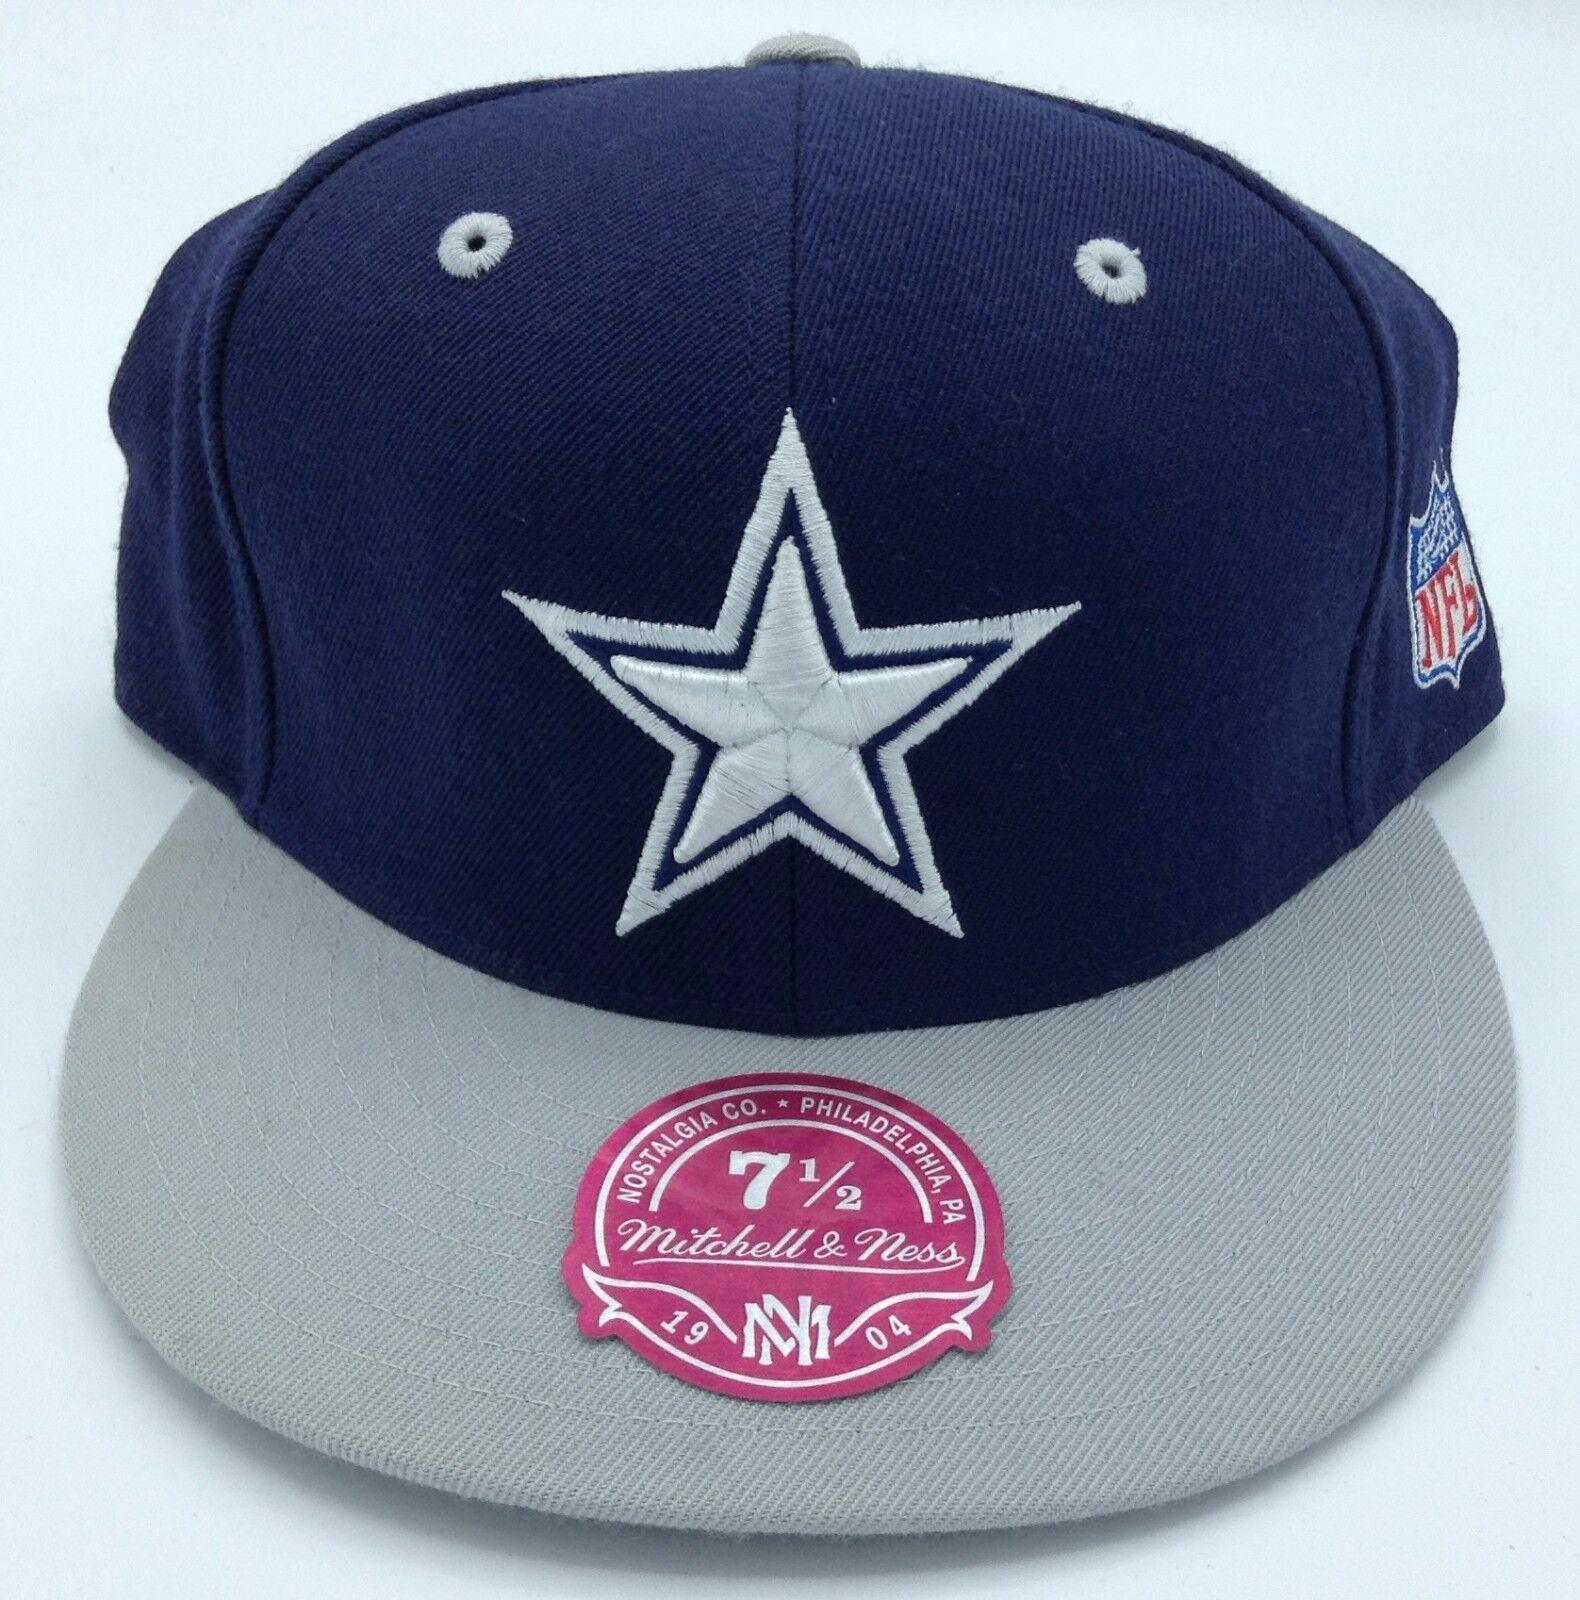 NFL Dallas Cowboys Mitchell & Ness Passende Strukturiert Kappe Mütze Beaniemütze